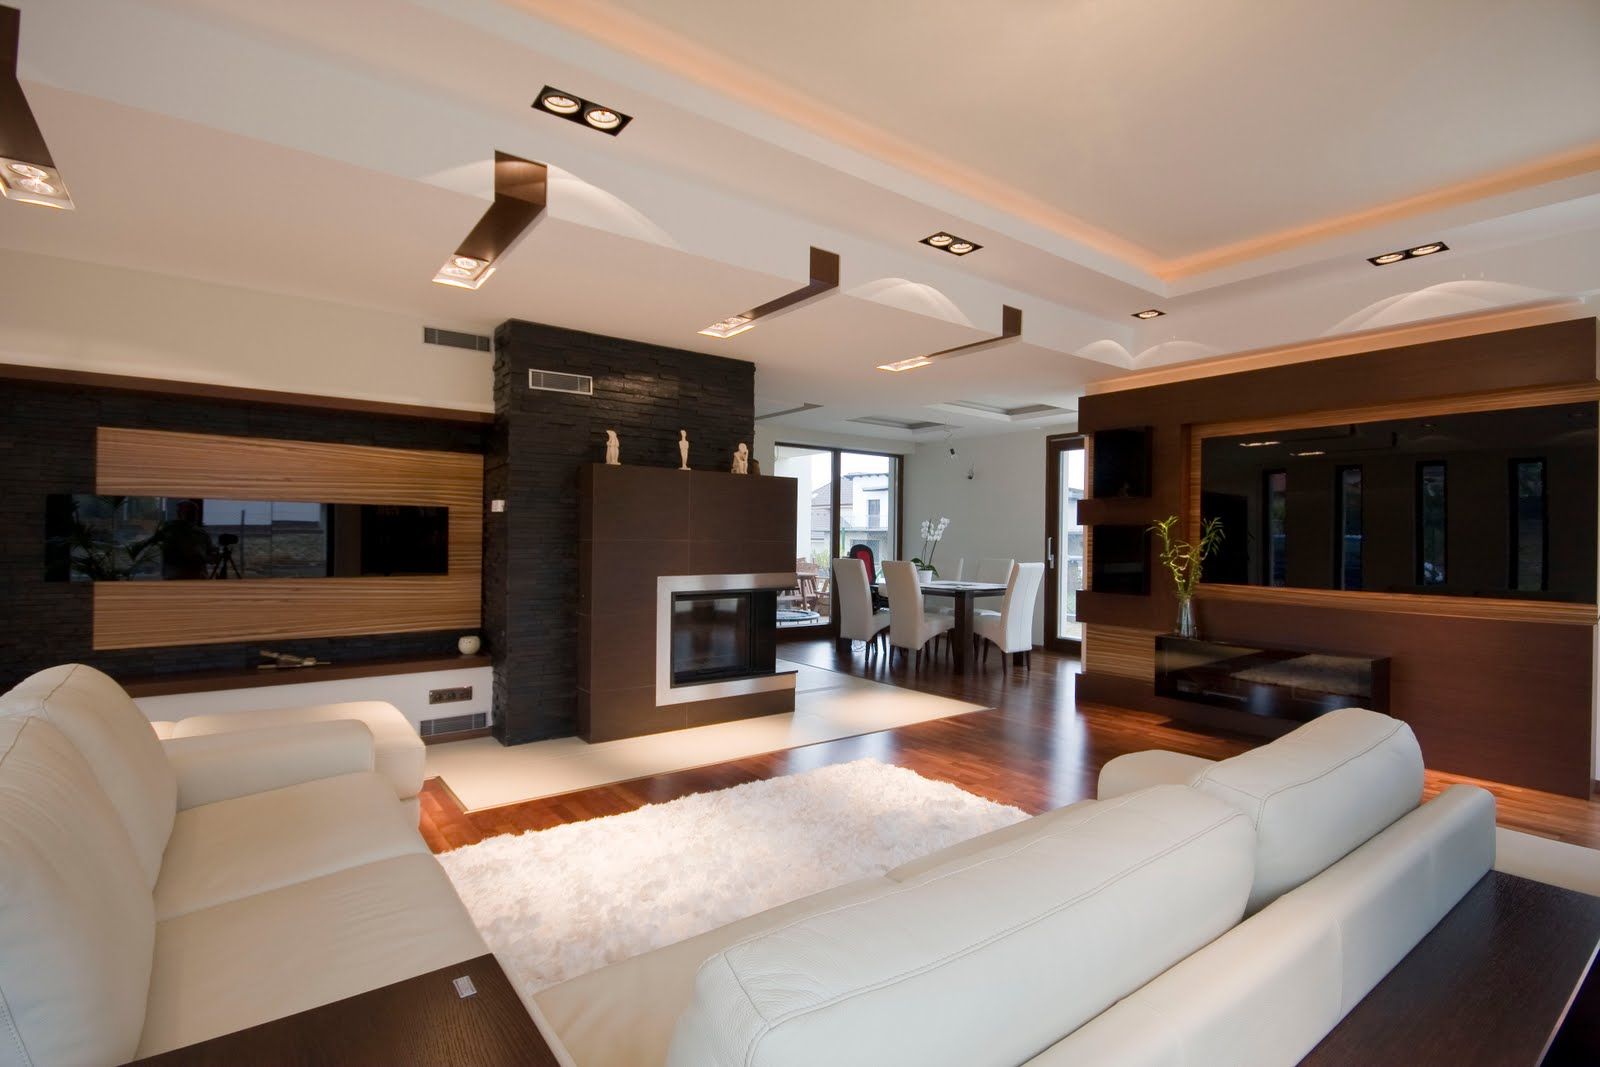 Modern-Living-Room-Ideas-2017-13 – PrinstonSMART.com